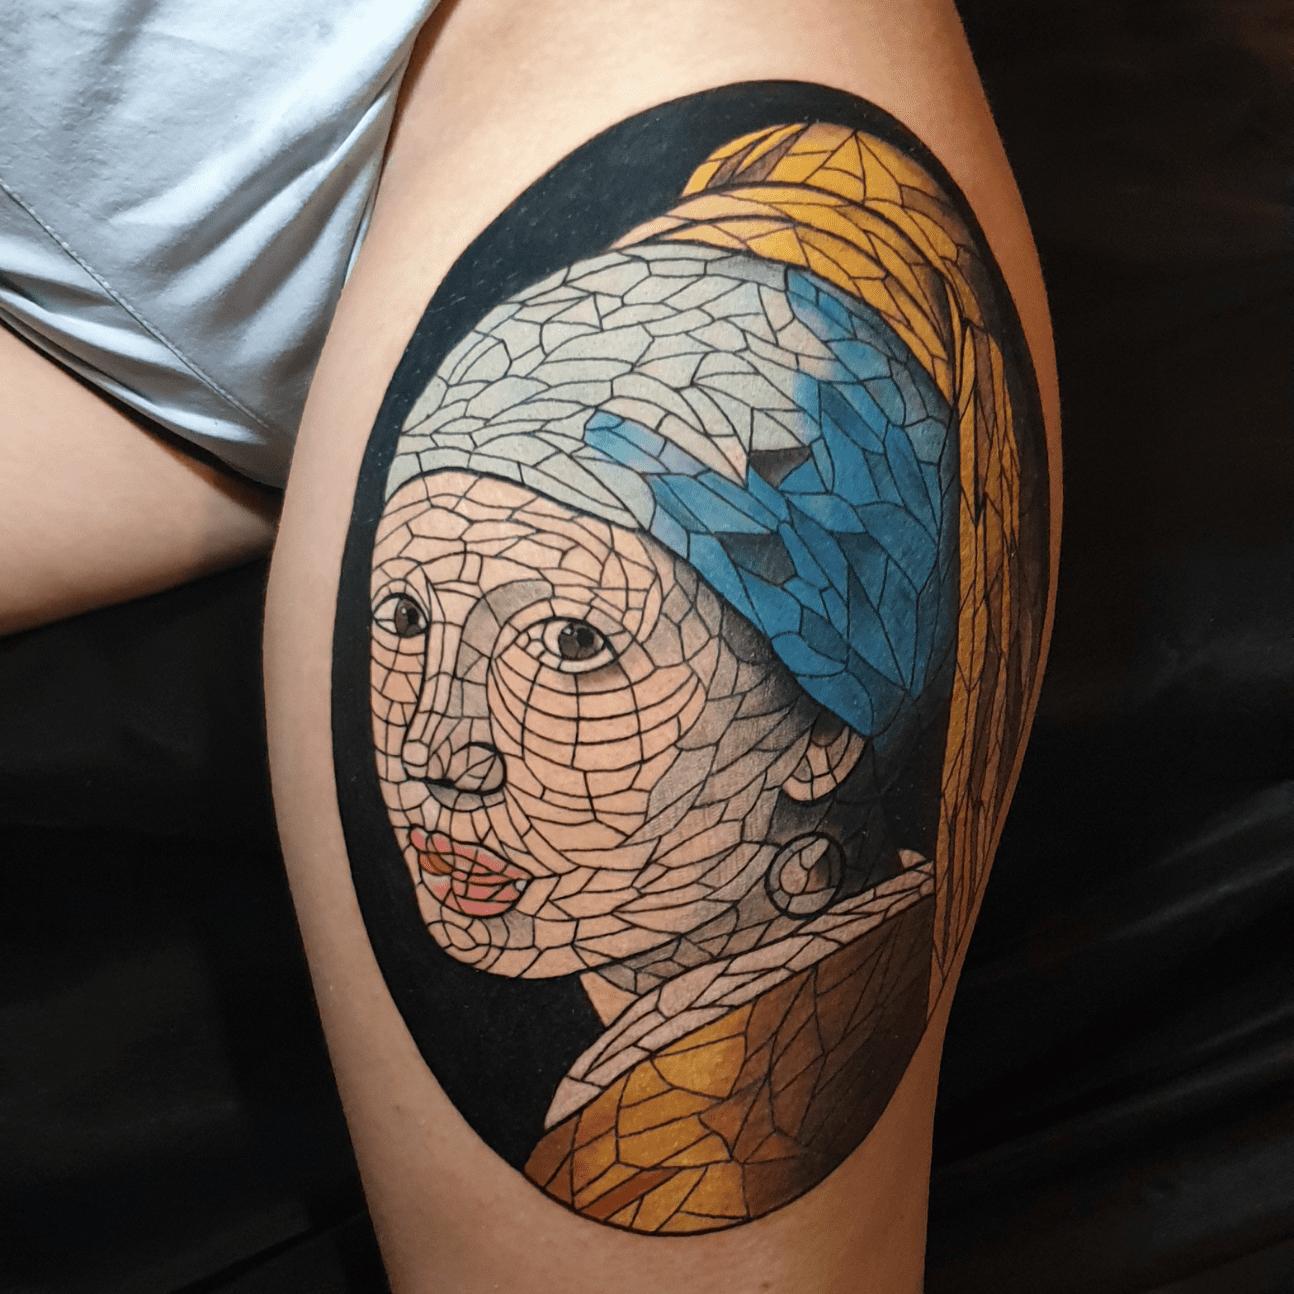 Mosaic tattoo tatuaggio sulla coscia